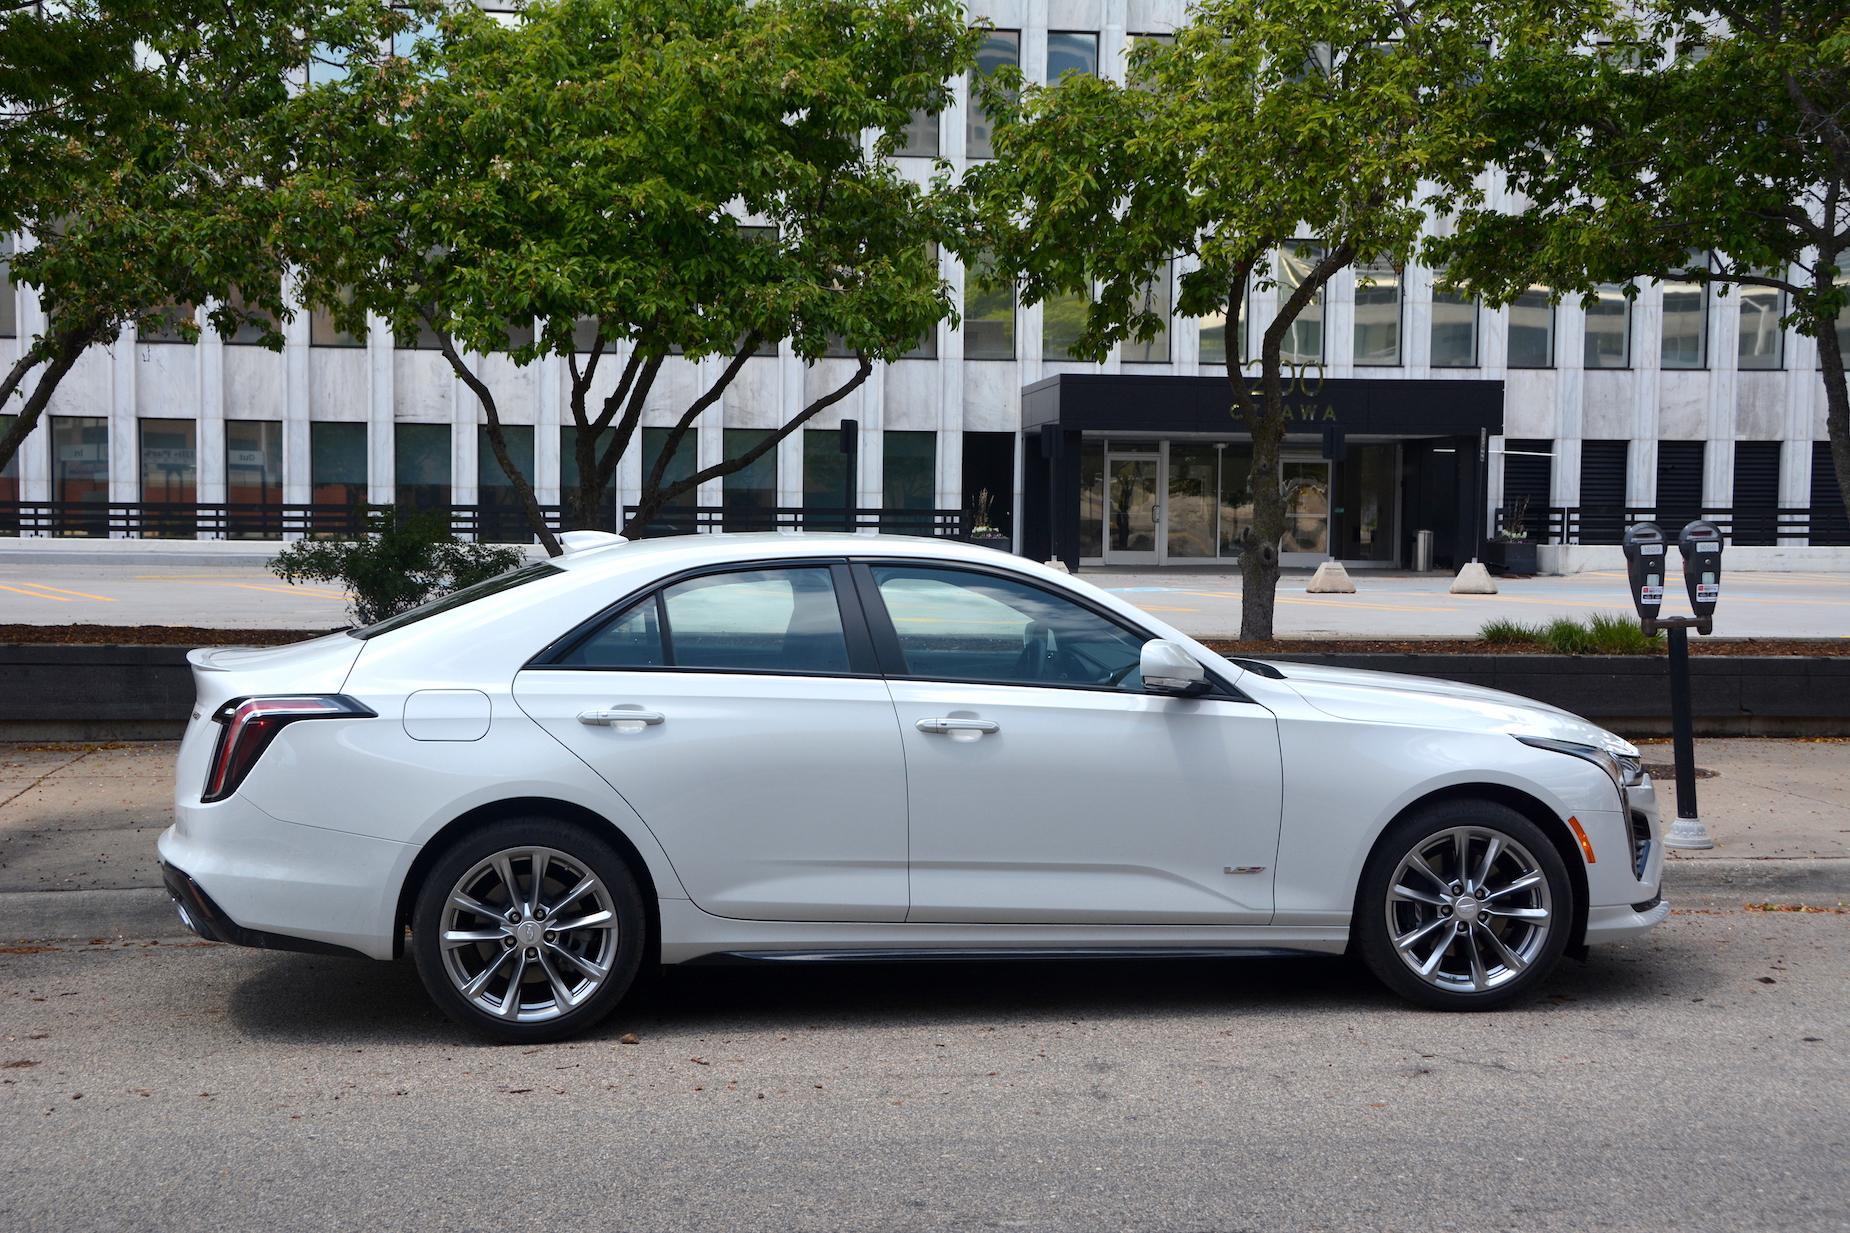 2021 Cadillac CT4-V side